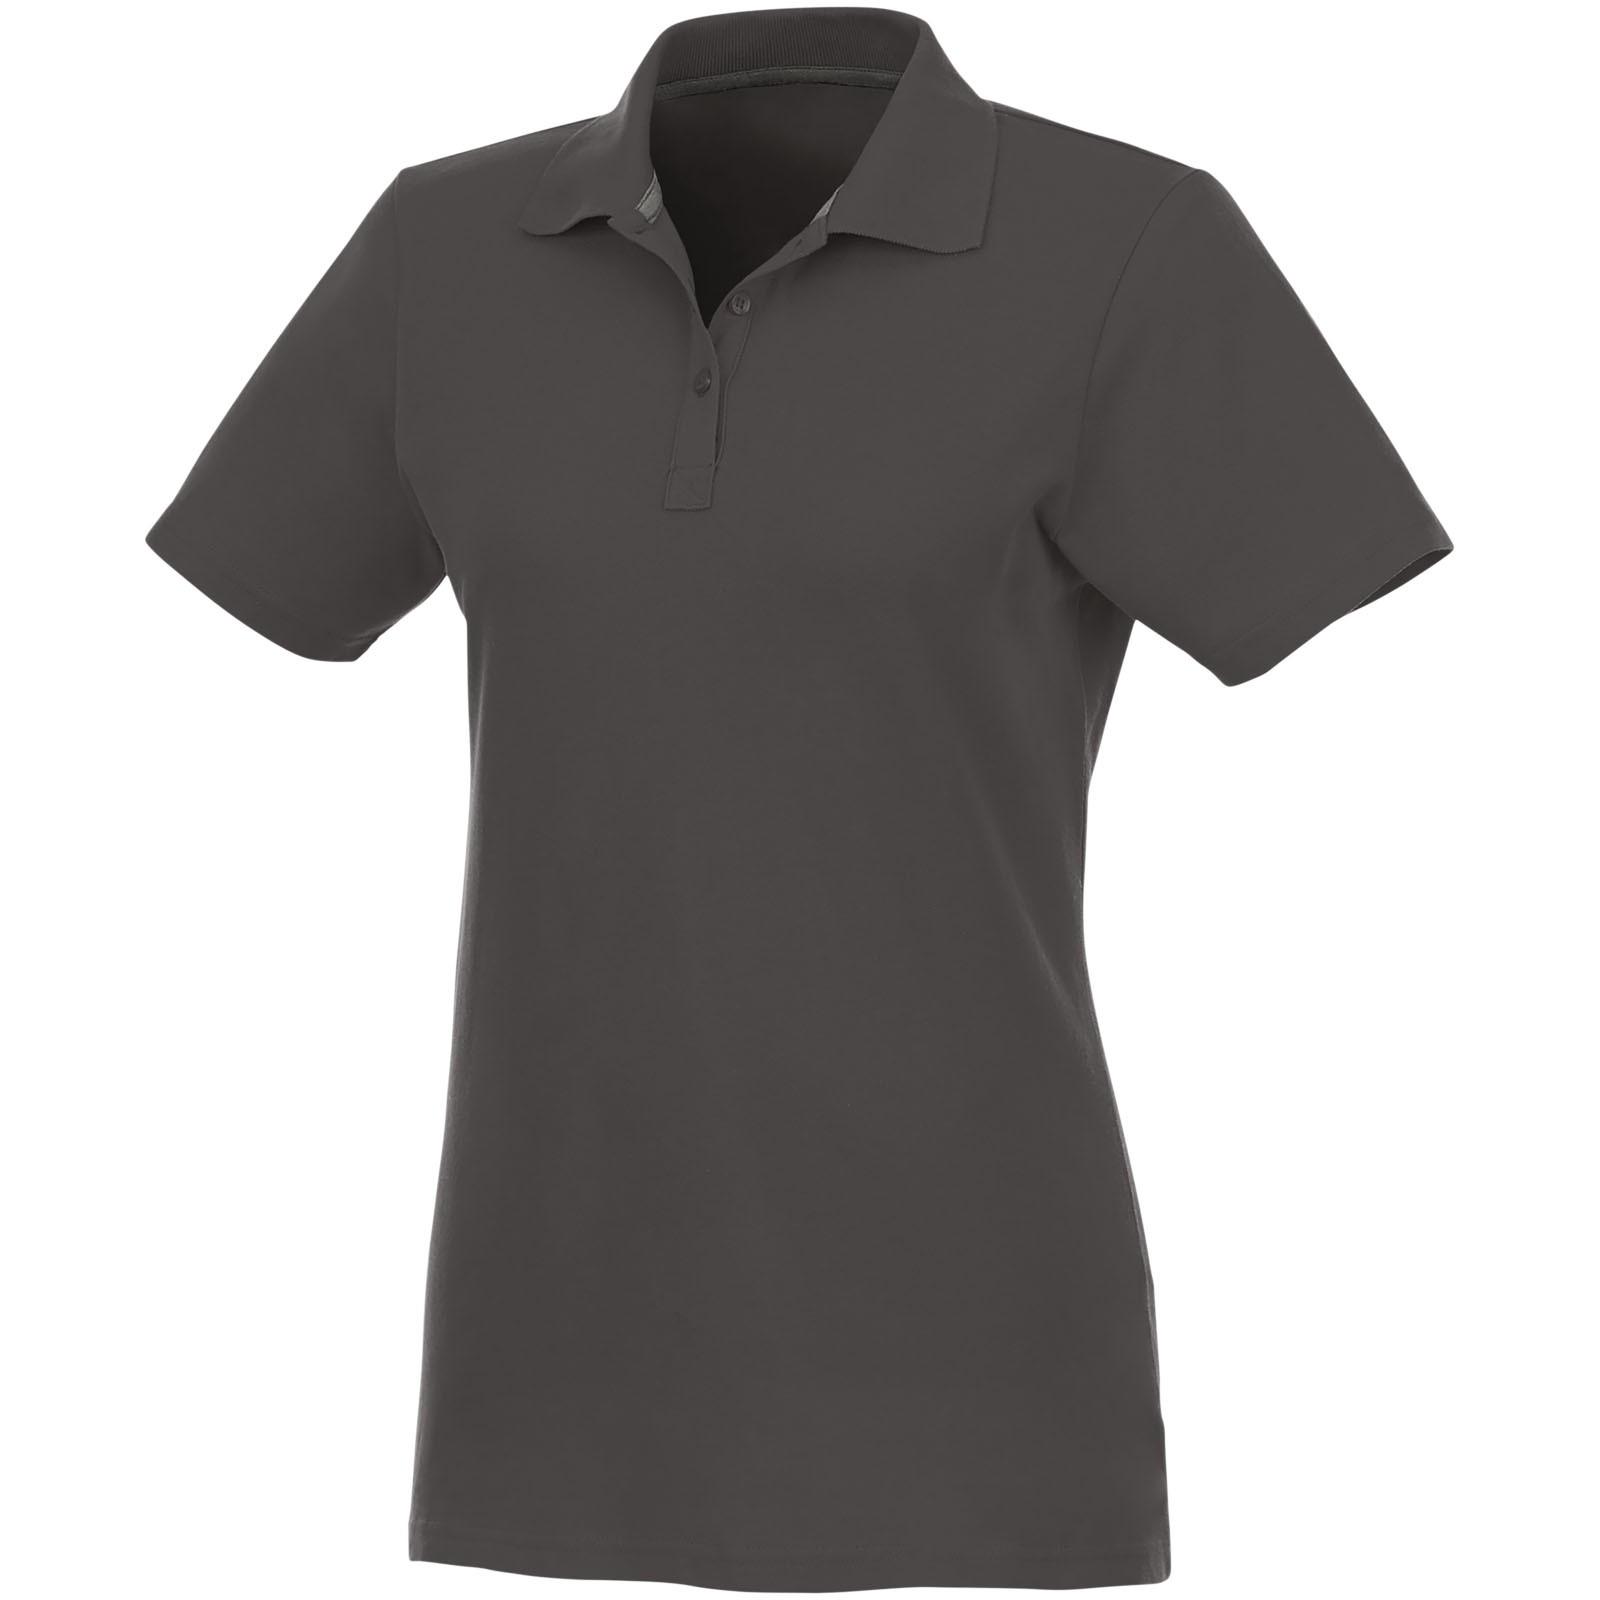 Helios short sleeve women's polo - Storm Grey / L